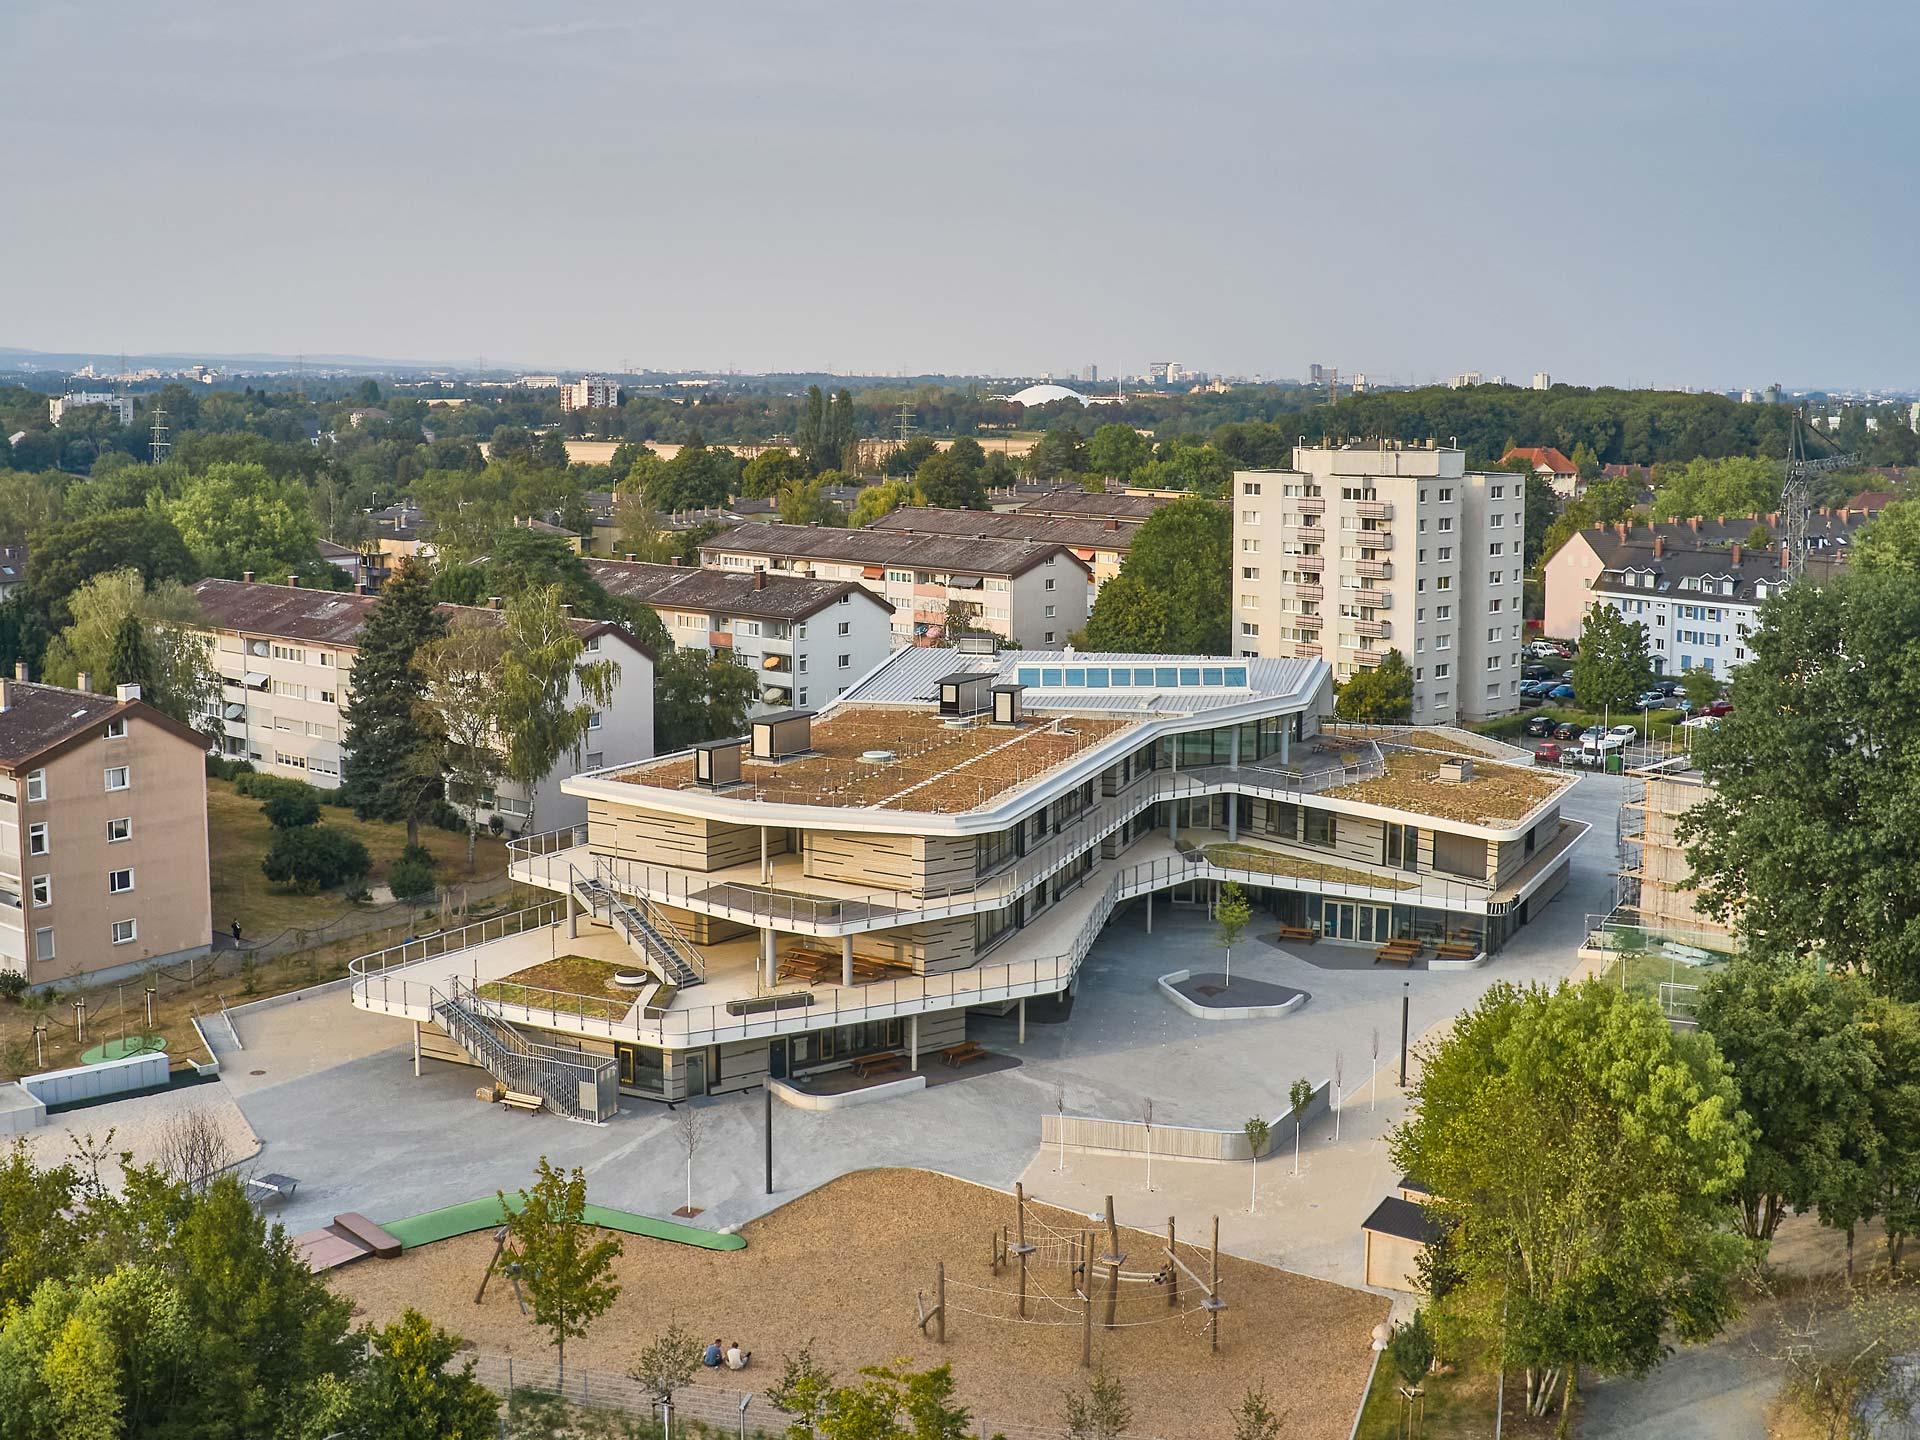 Primary School Ludwig-Weber-Schule